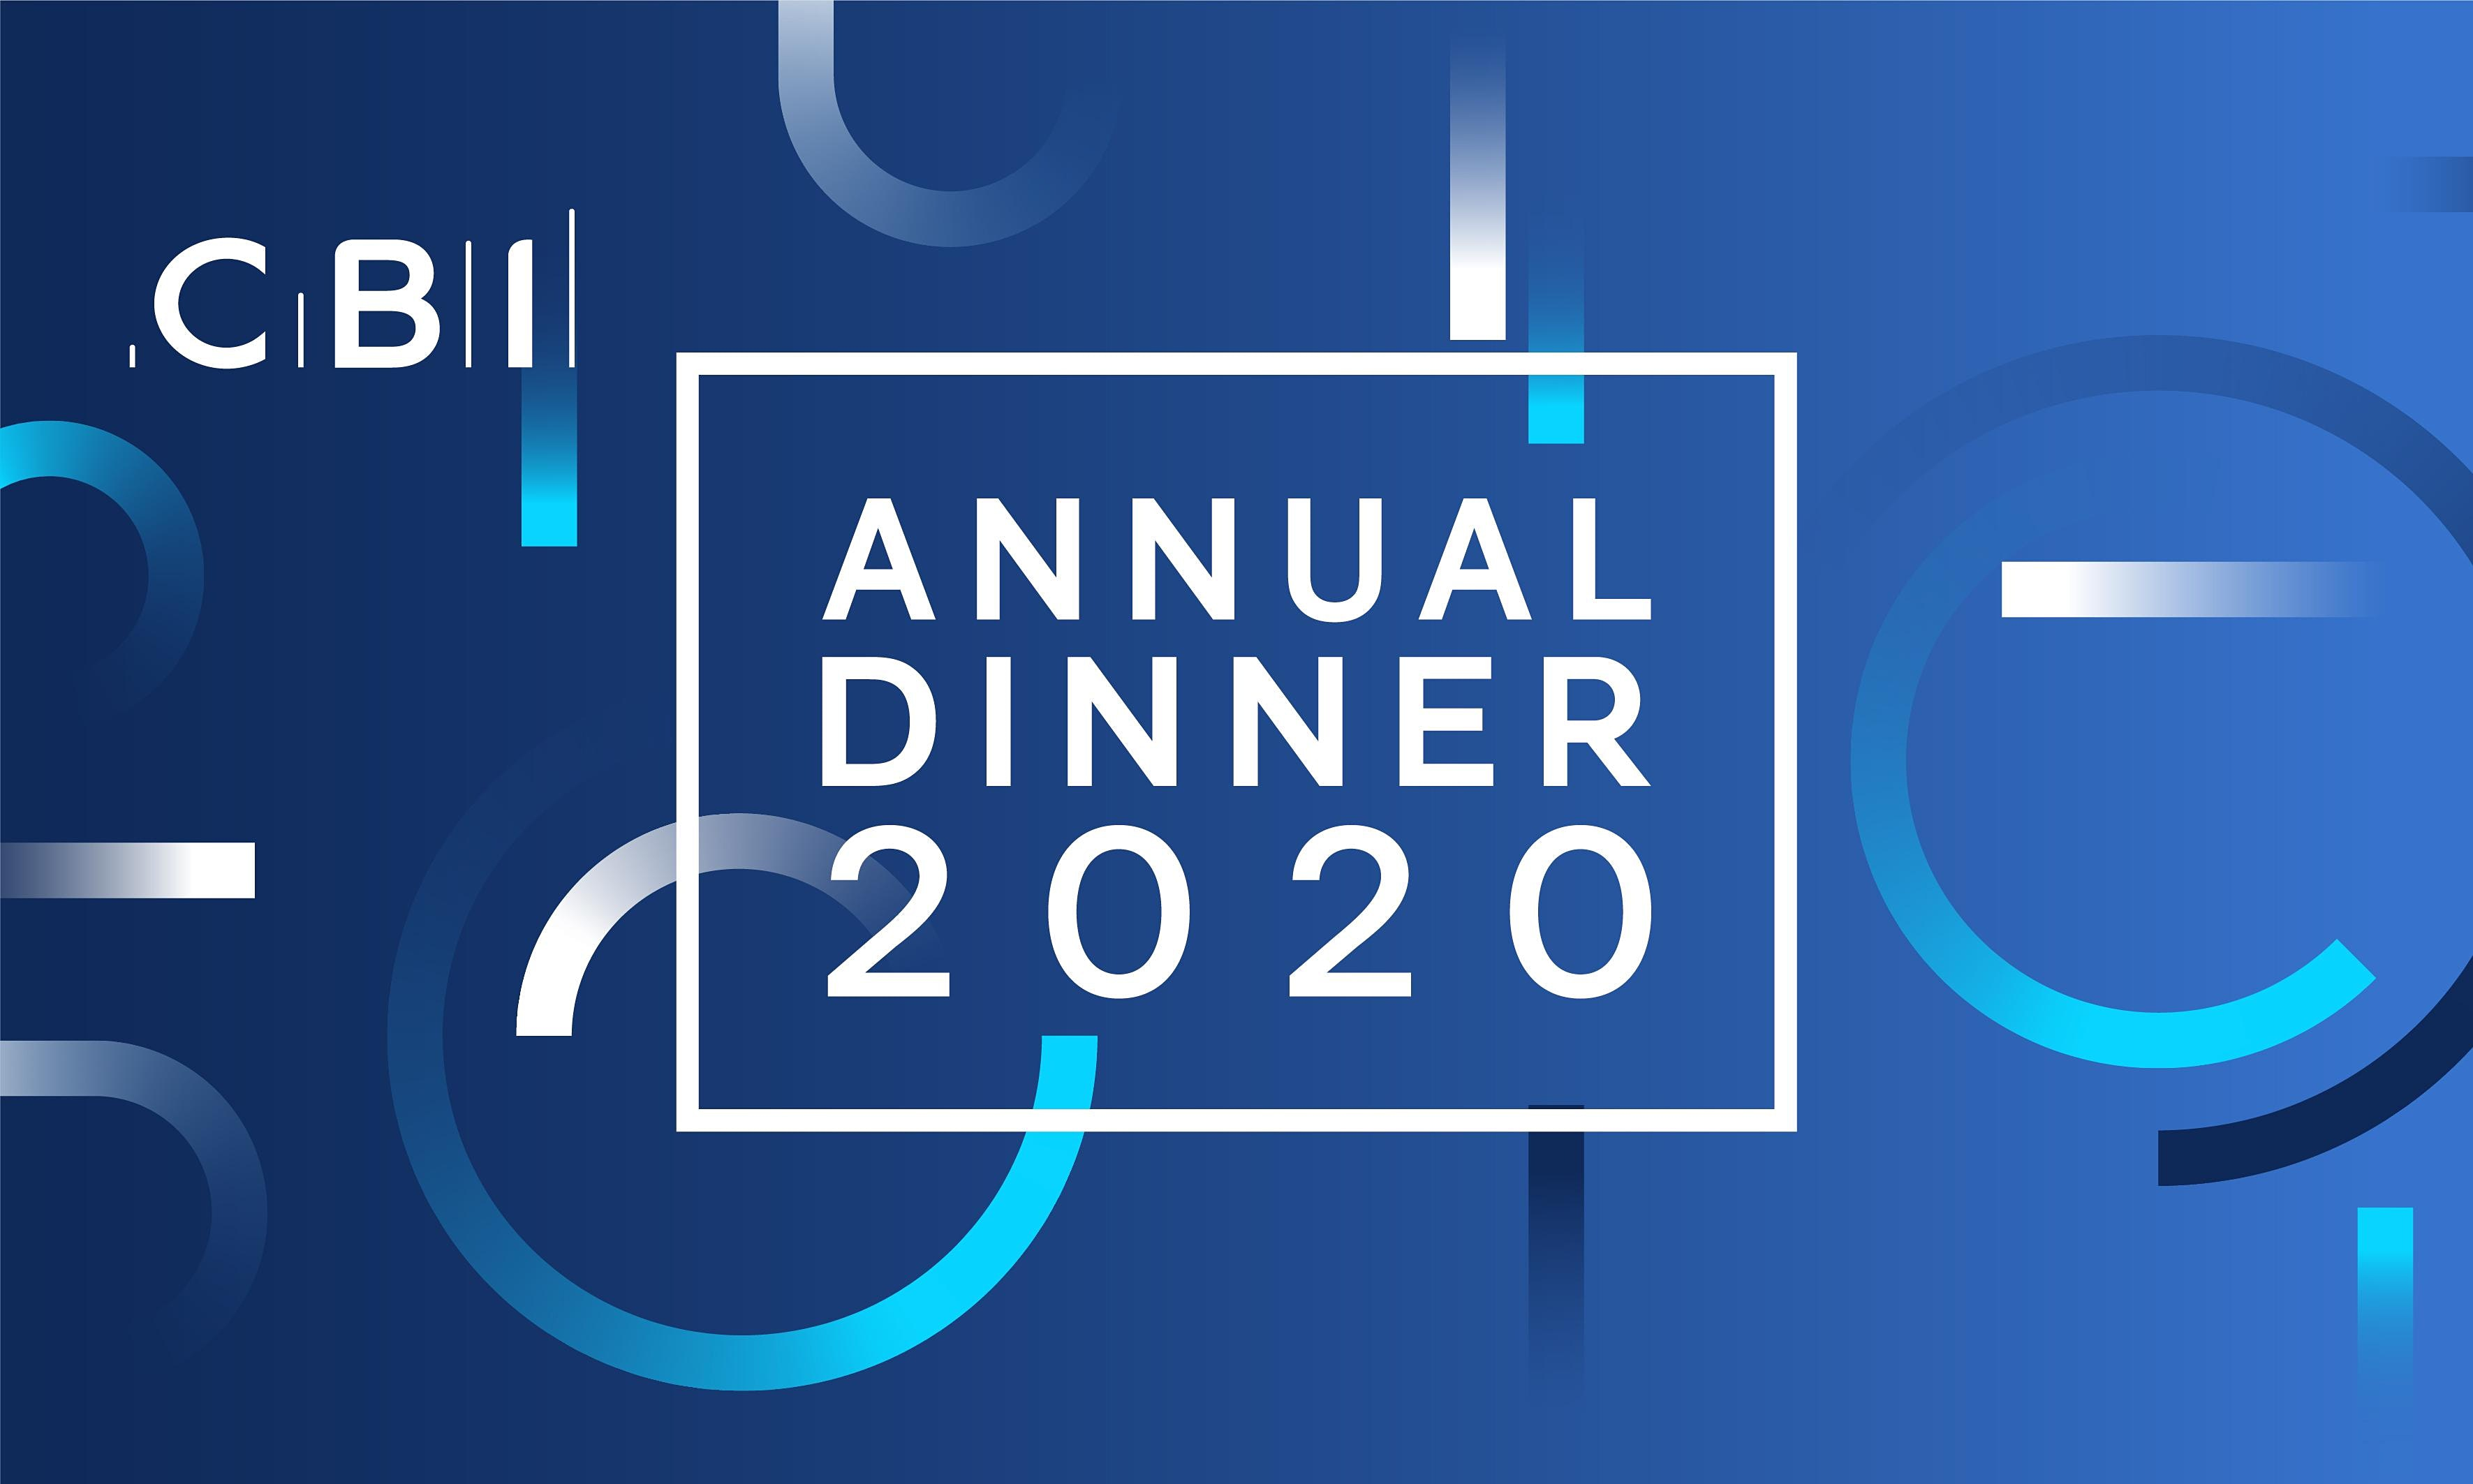 CBI Northern Ireland Annual Dinner 2020